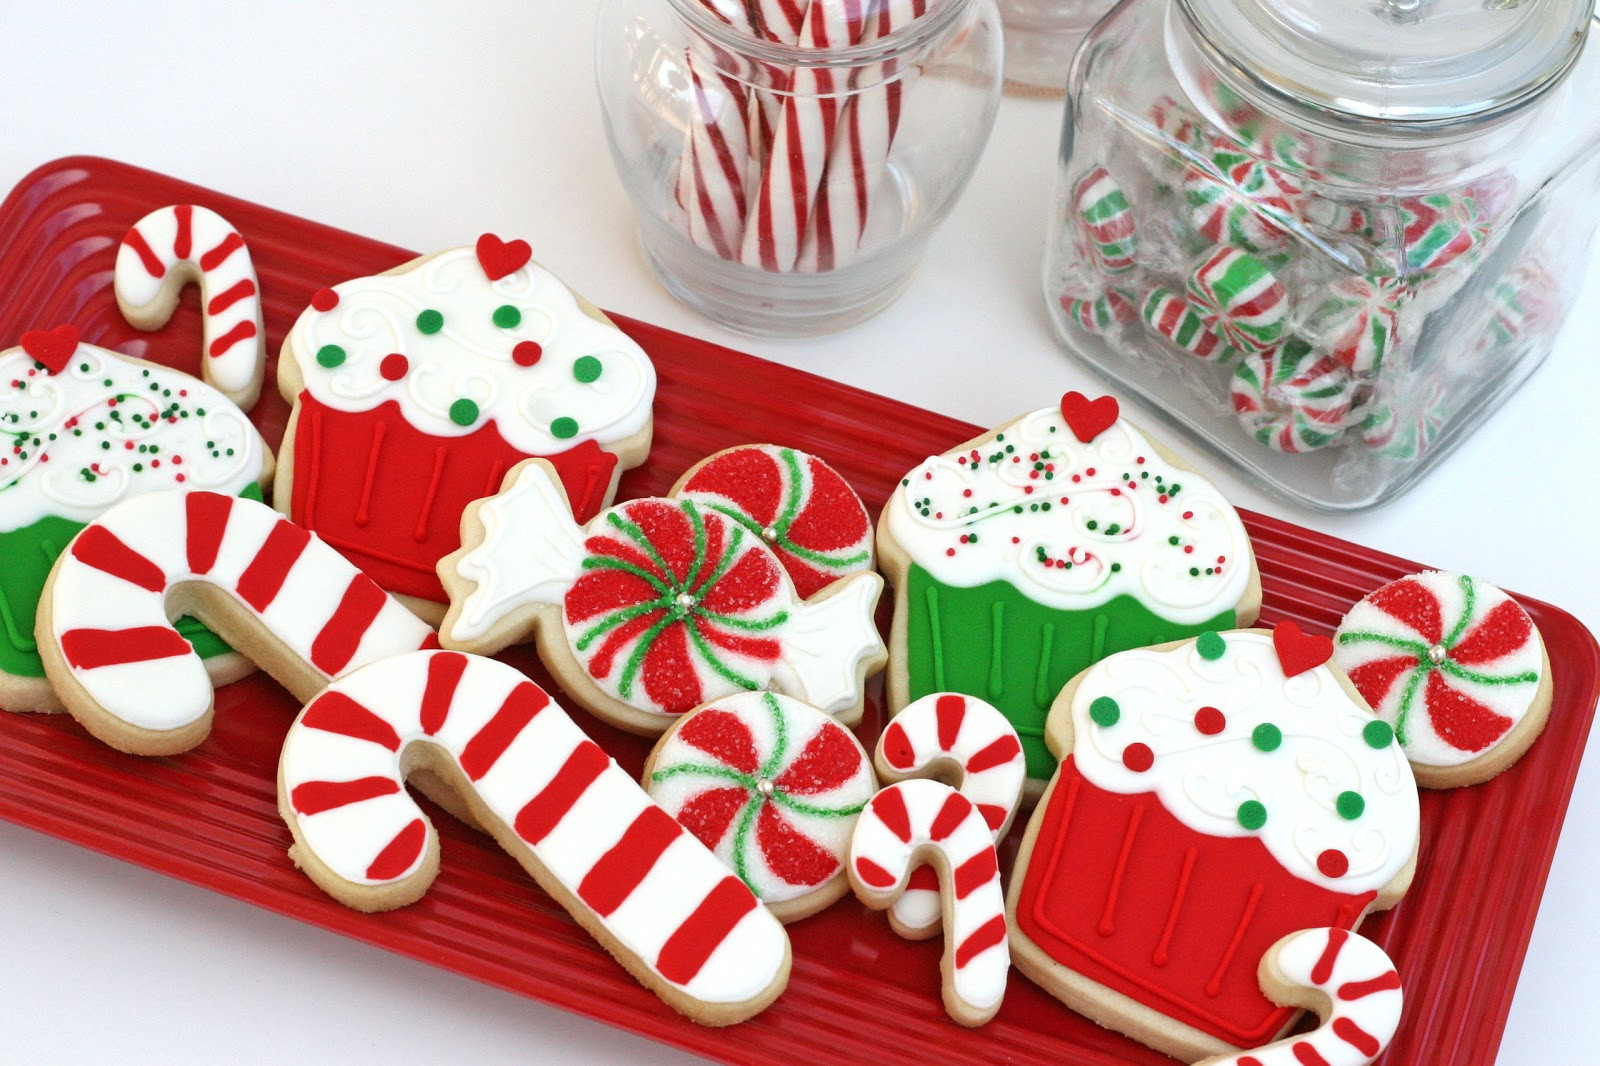 Christmas Cookies Decorating Ideas  Christmas Cookies Galore Glorious Treats